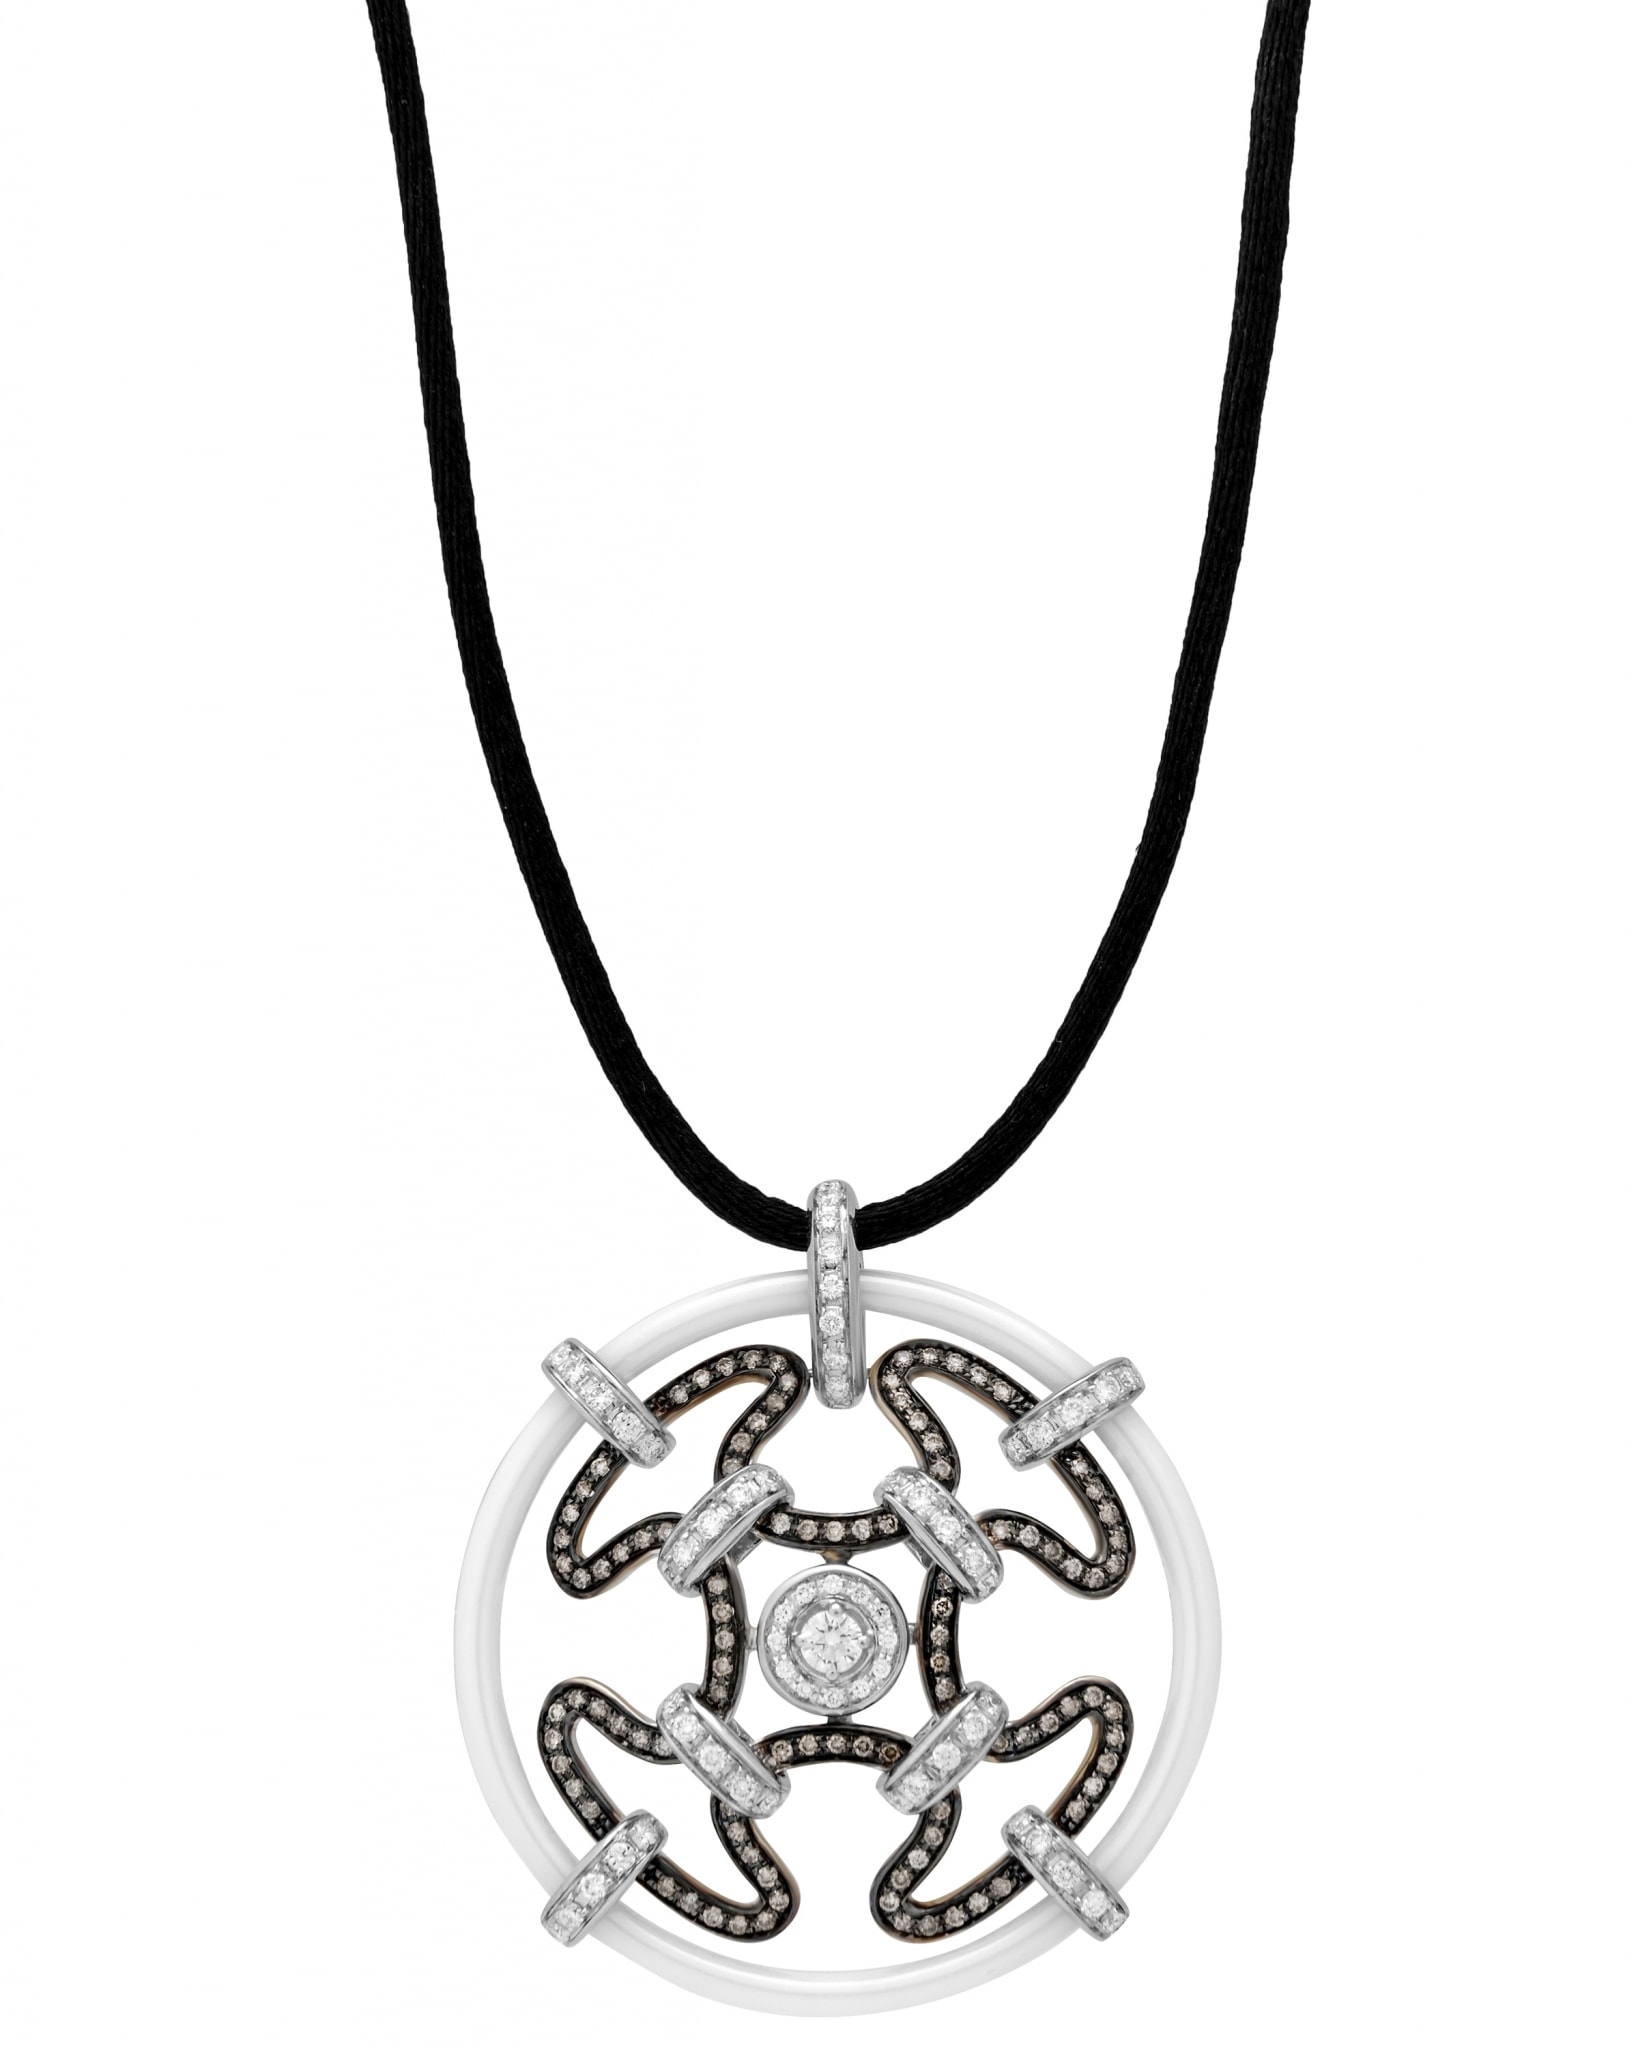 GIANNI LAZZARO – 18K White and Rose Gold, and Ceramic, Diamonds,& Tsavorite, Necklace